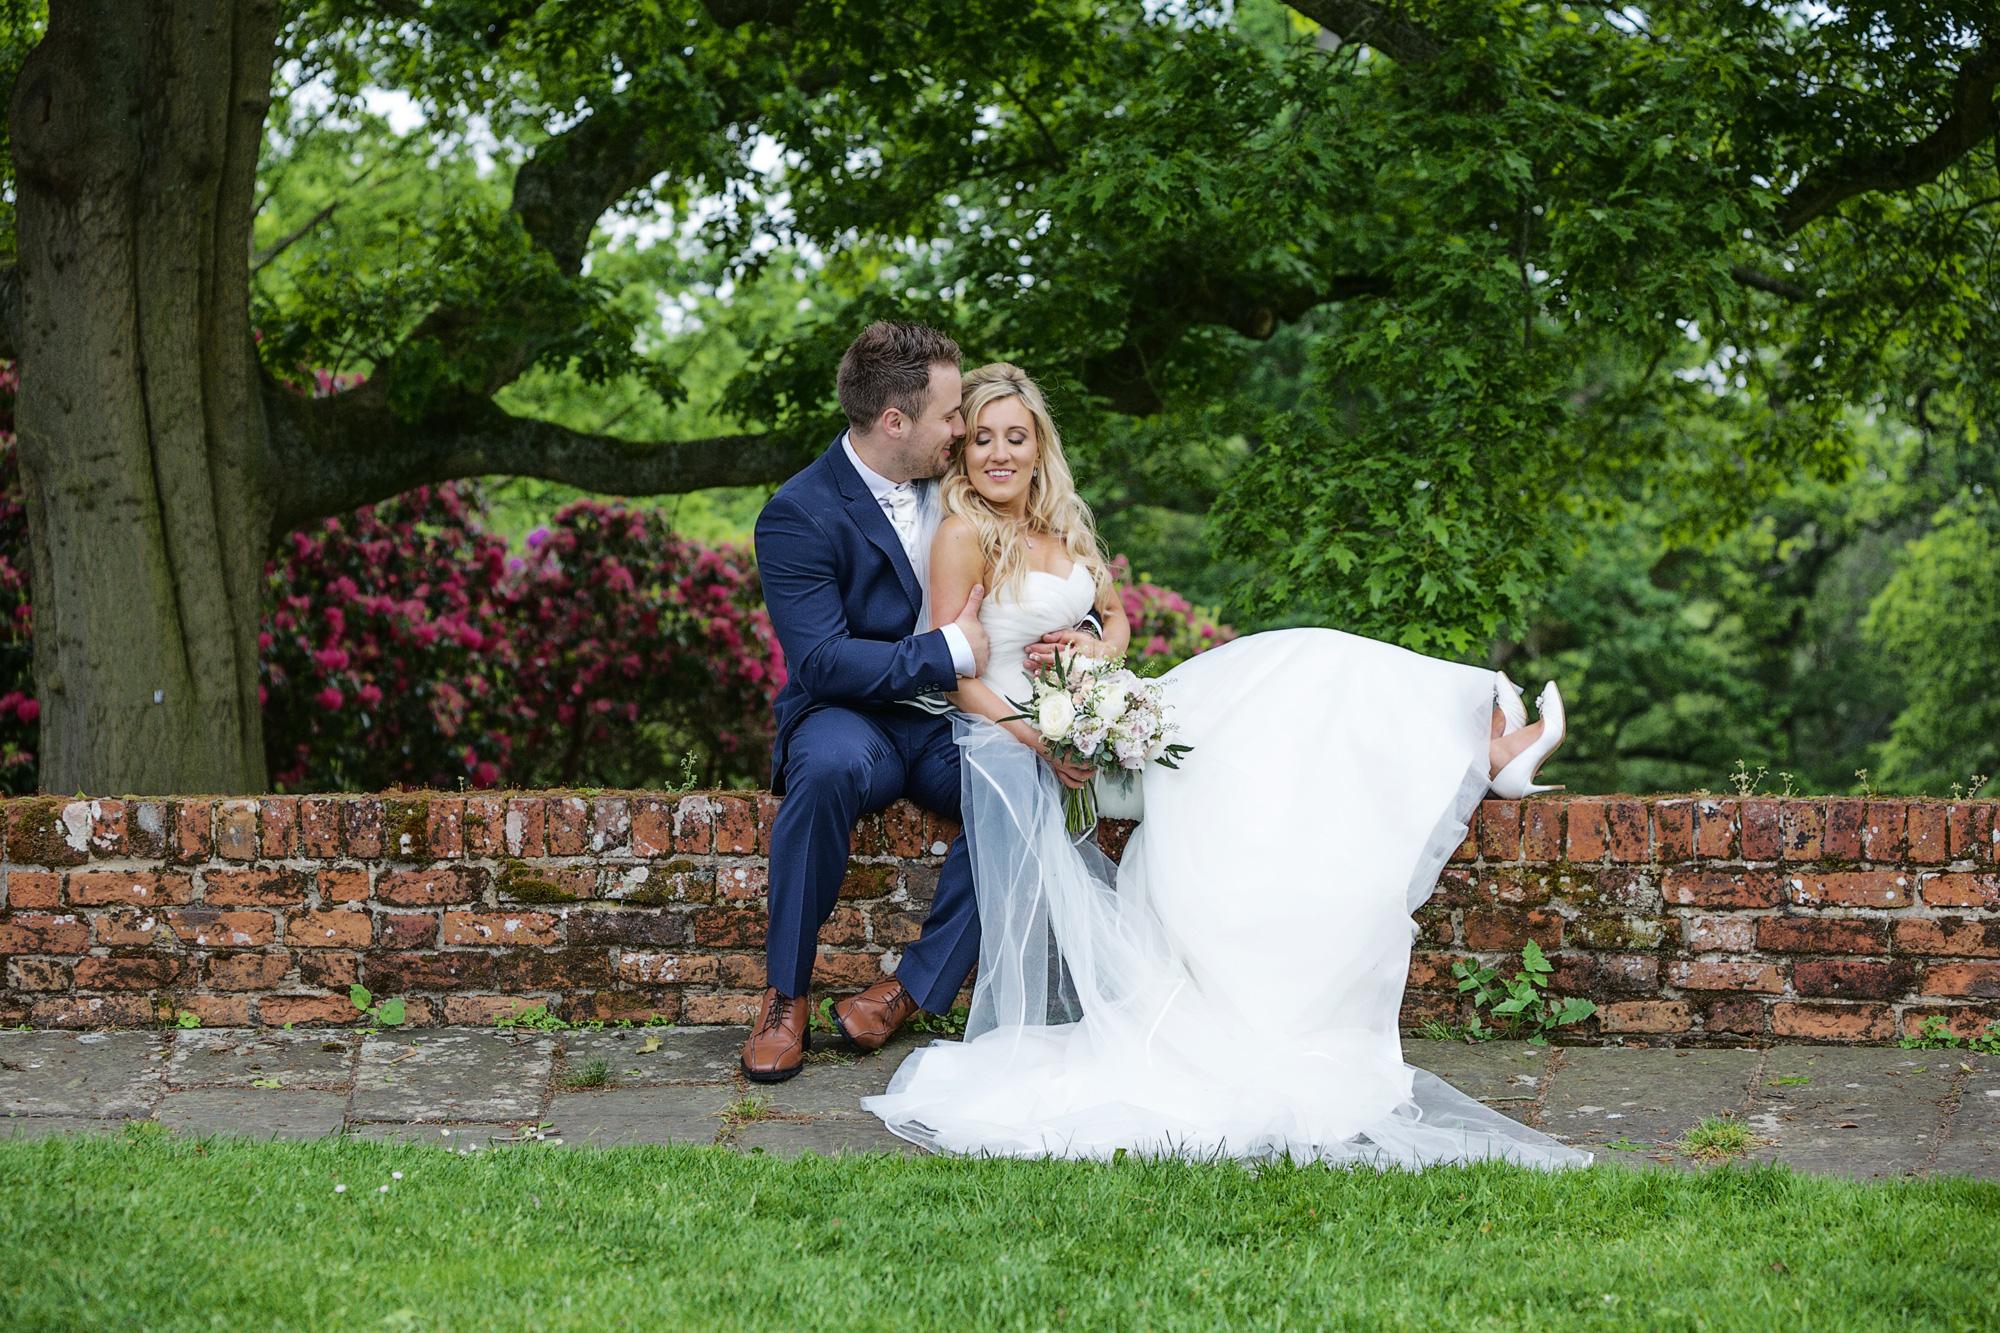 Adam_Hillier_Wedding_Photographer_Newbury_Berkshire_7 (9).jpg